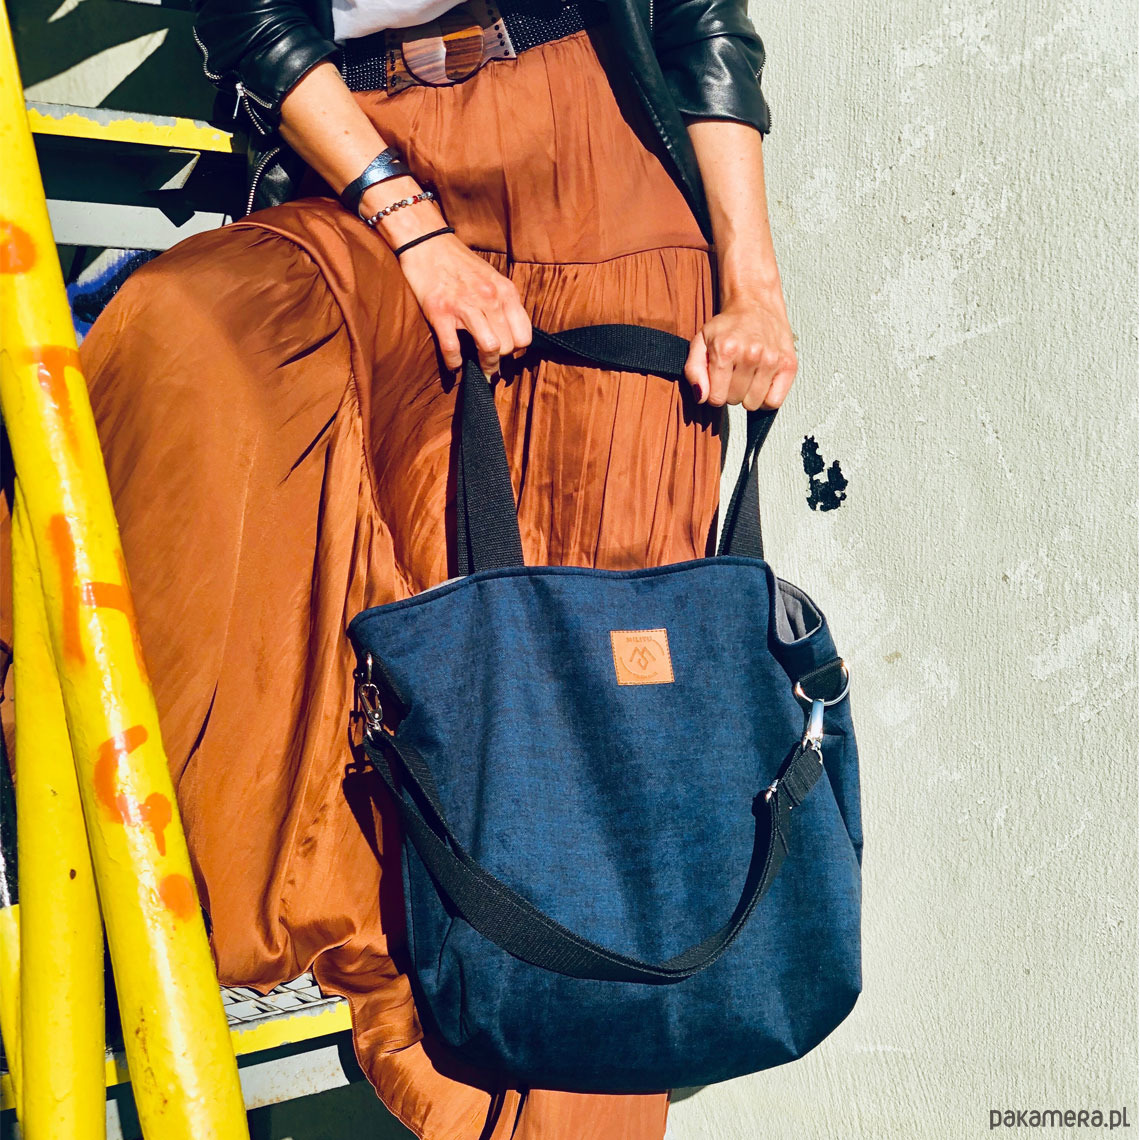 Duża torba shopperka Mili Duo granatowa